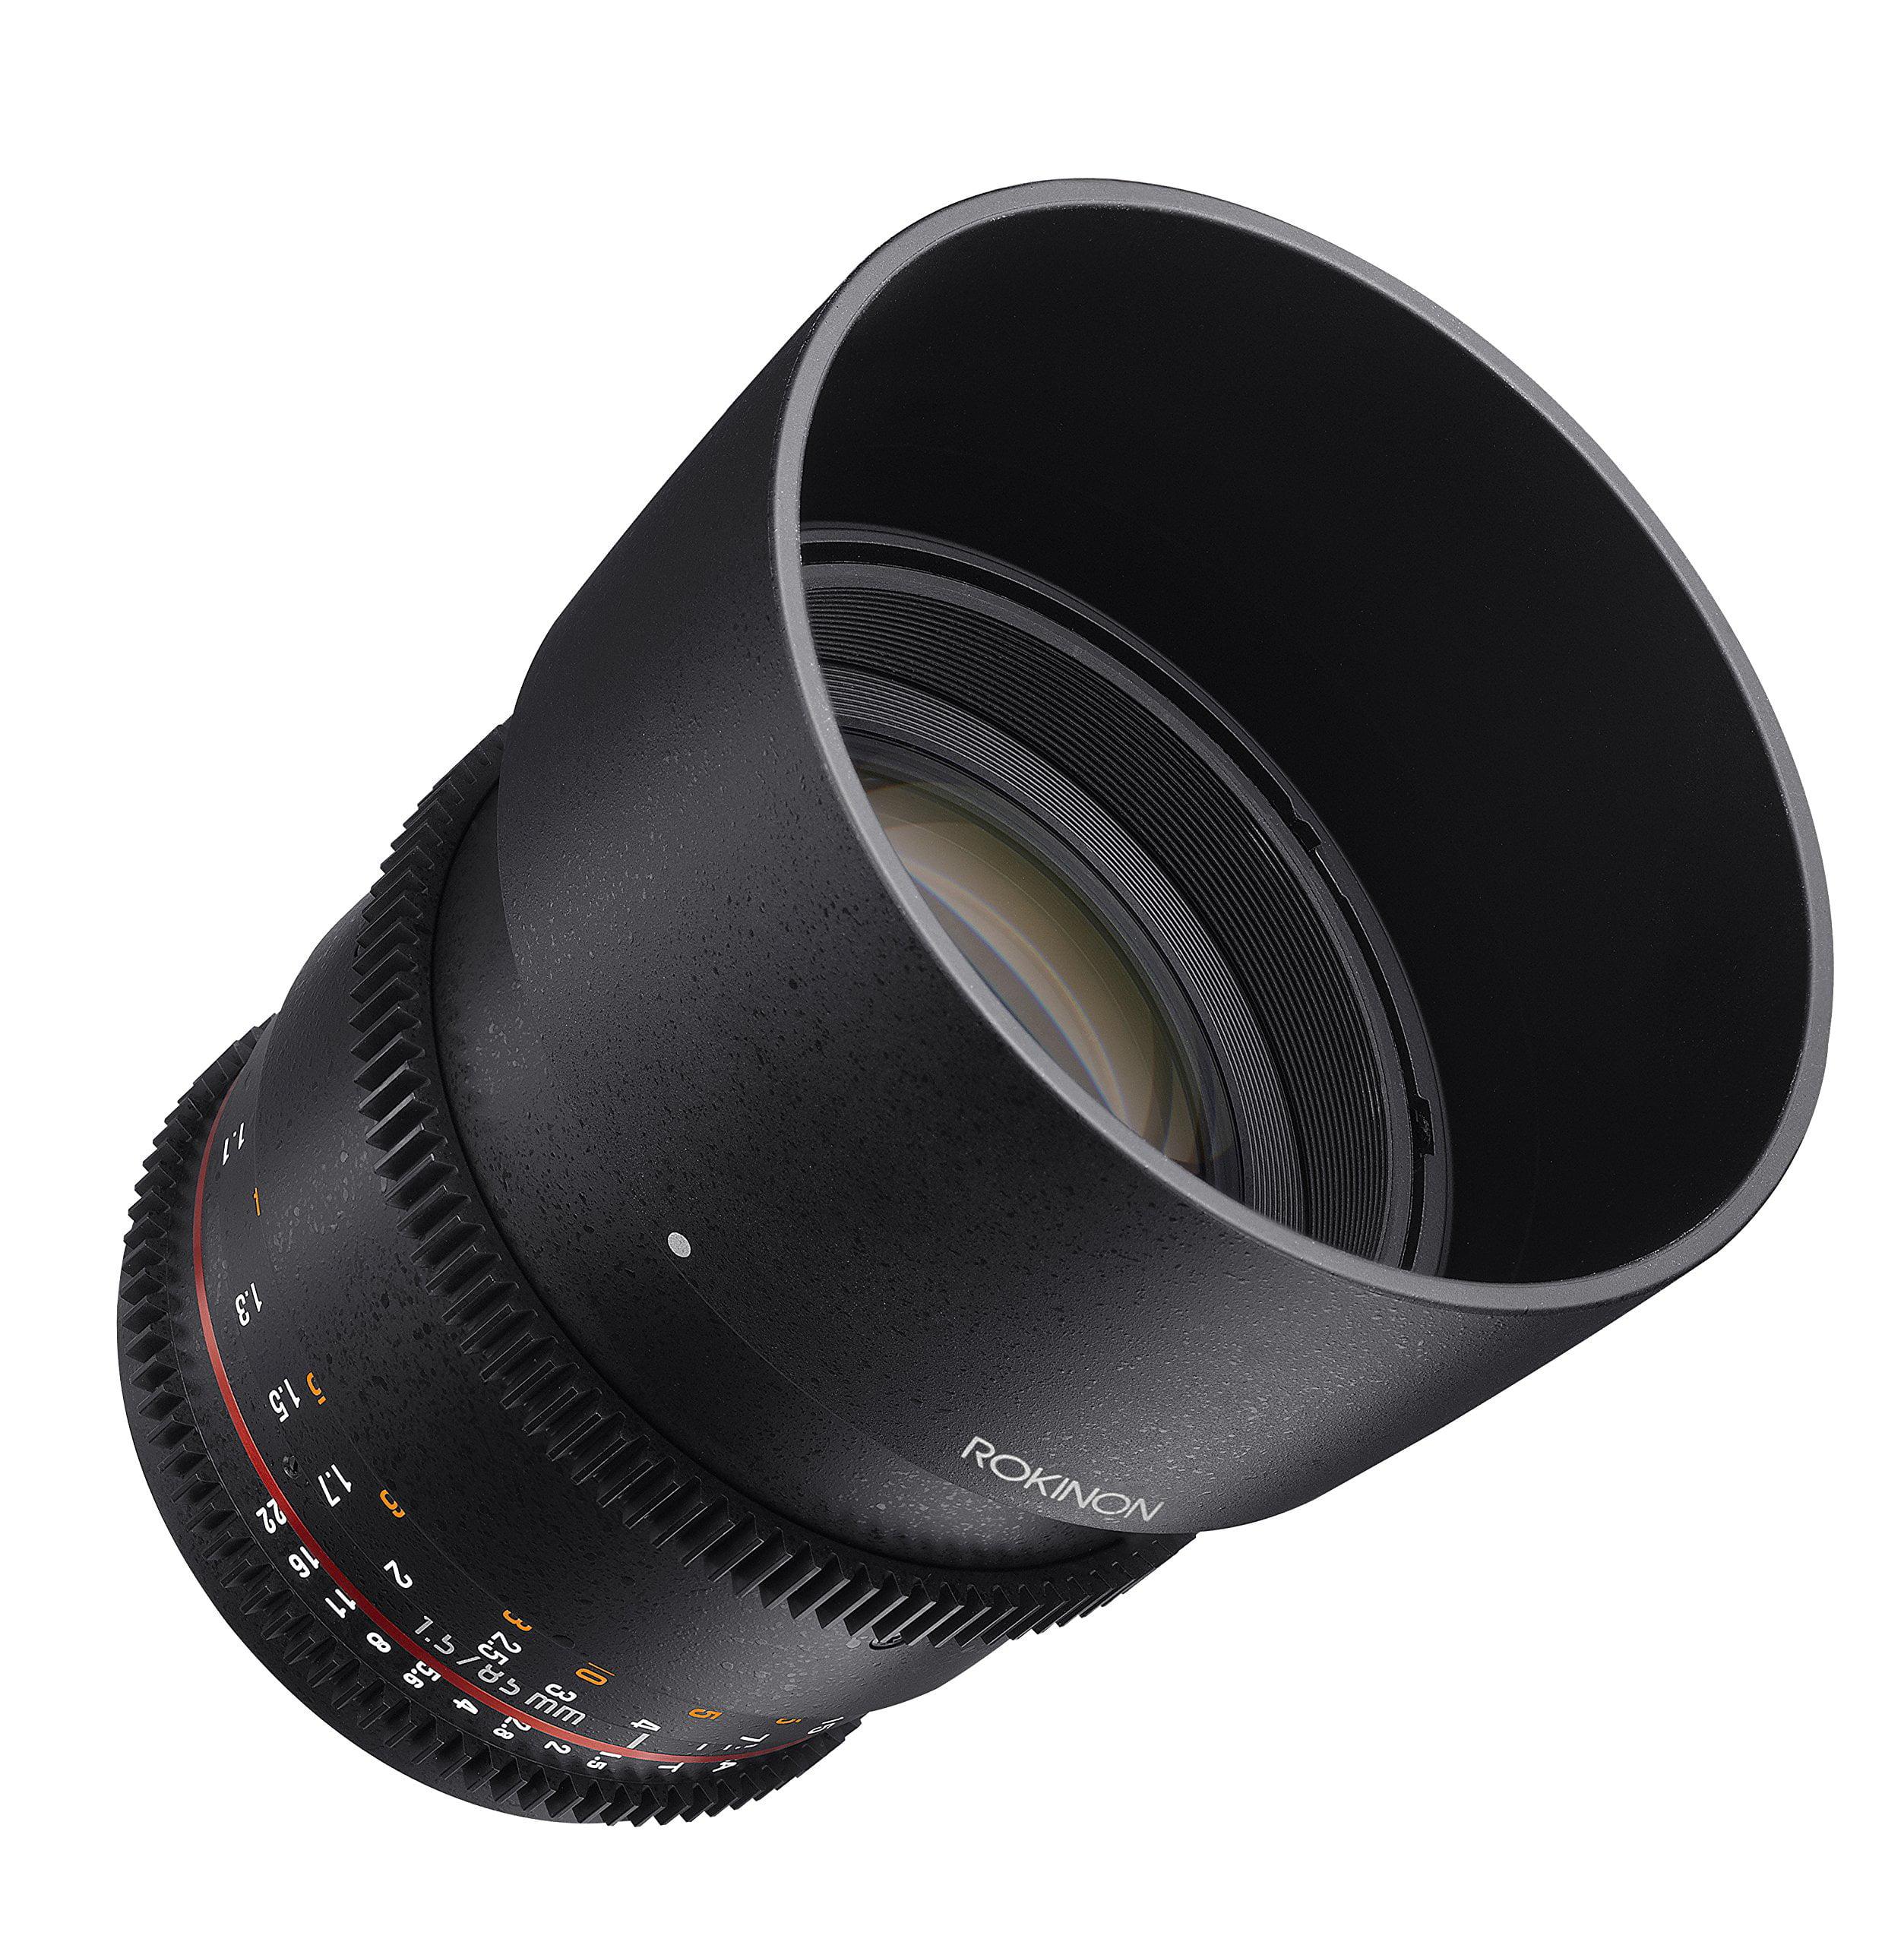 ROKINON 85mm T1.5 Cine Aspherical Lens for Micro 4/3 Cameras